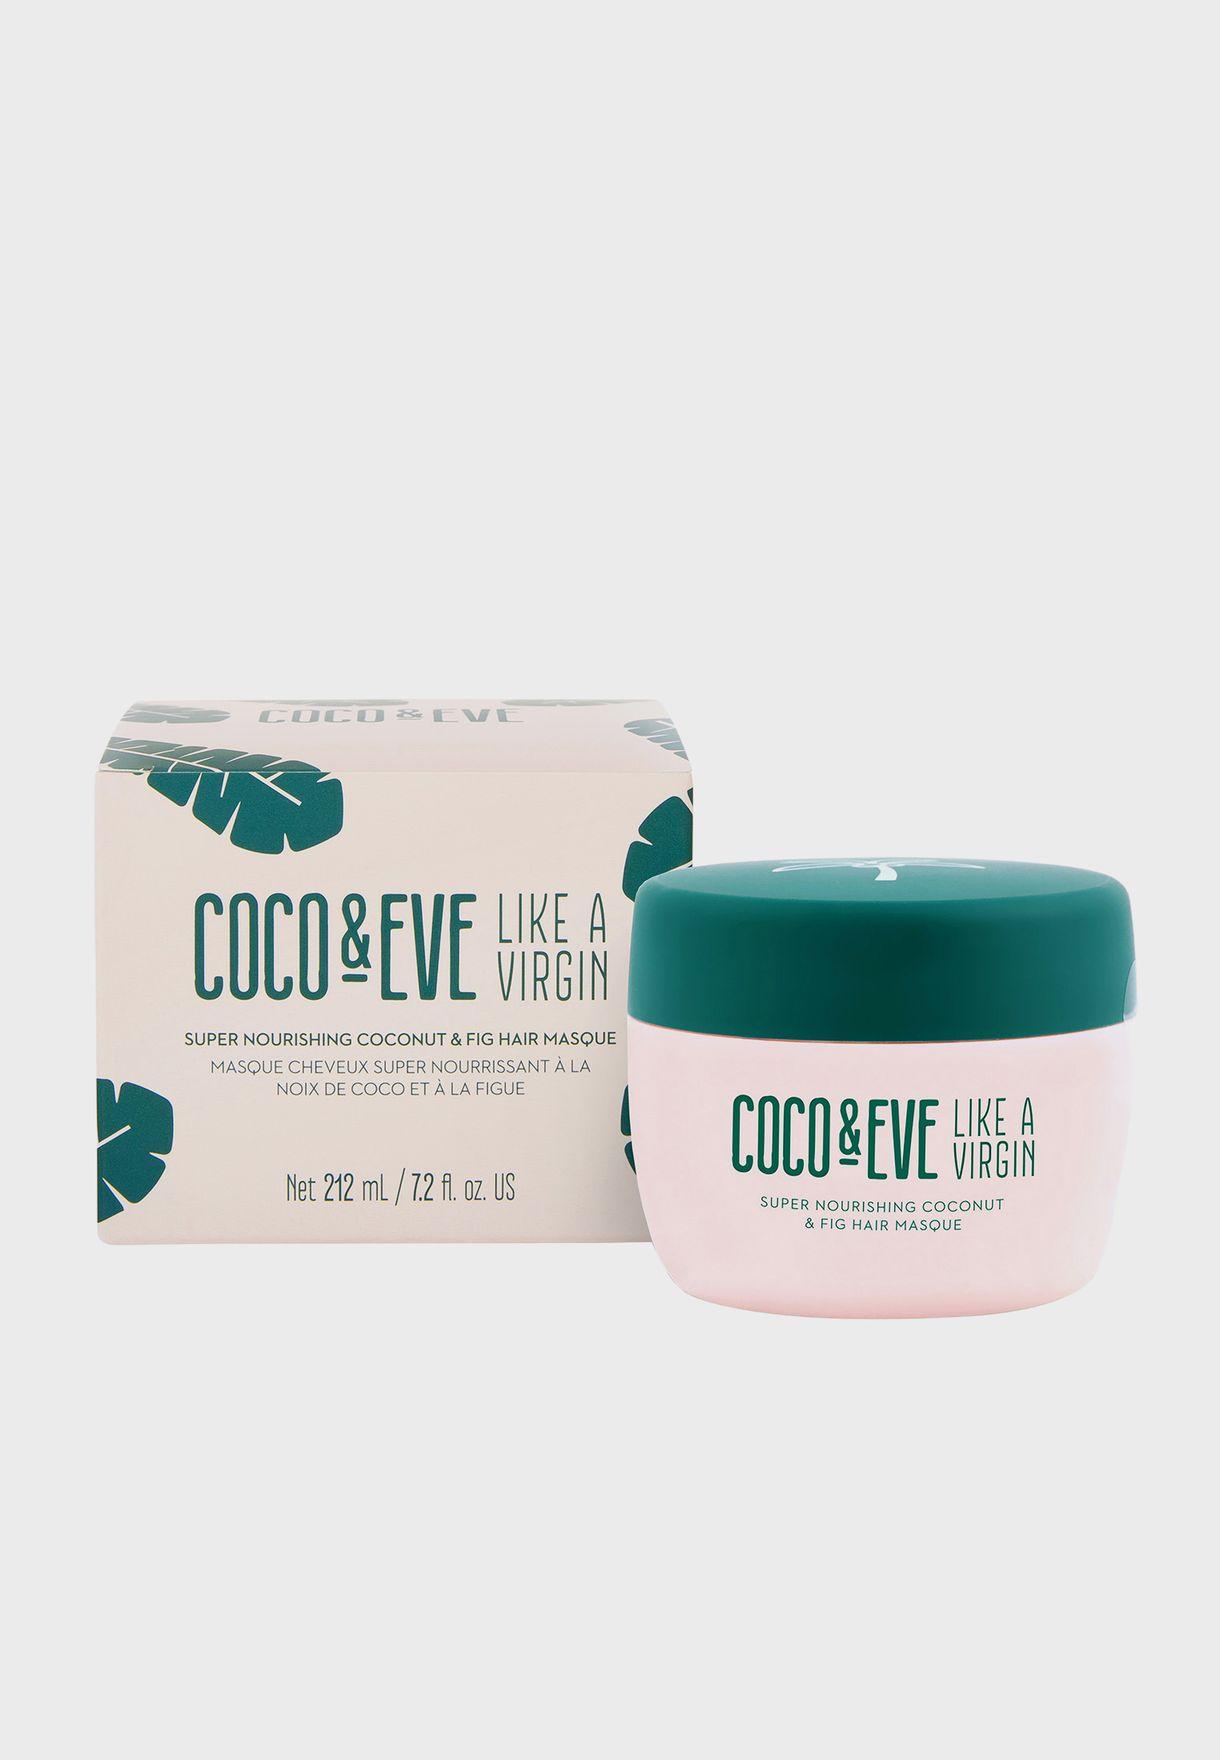 Super Nourishing Coconut & Fig Hair Masque